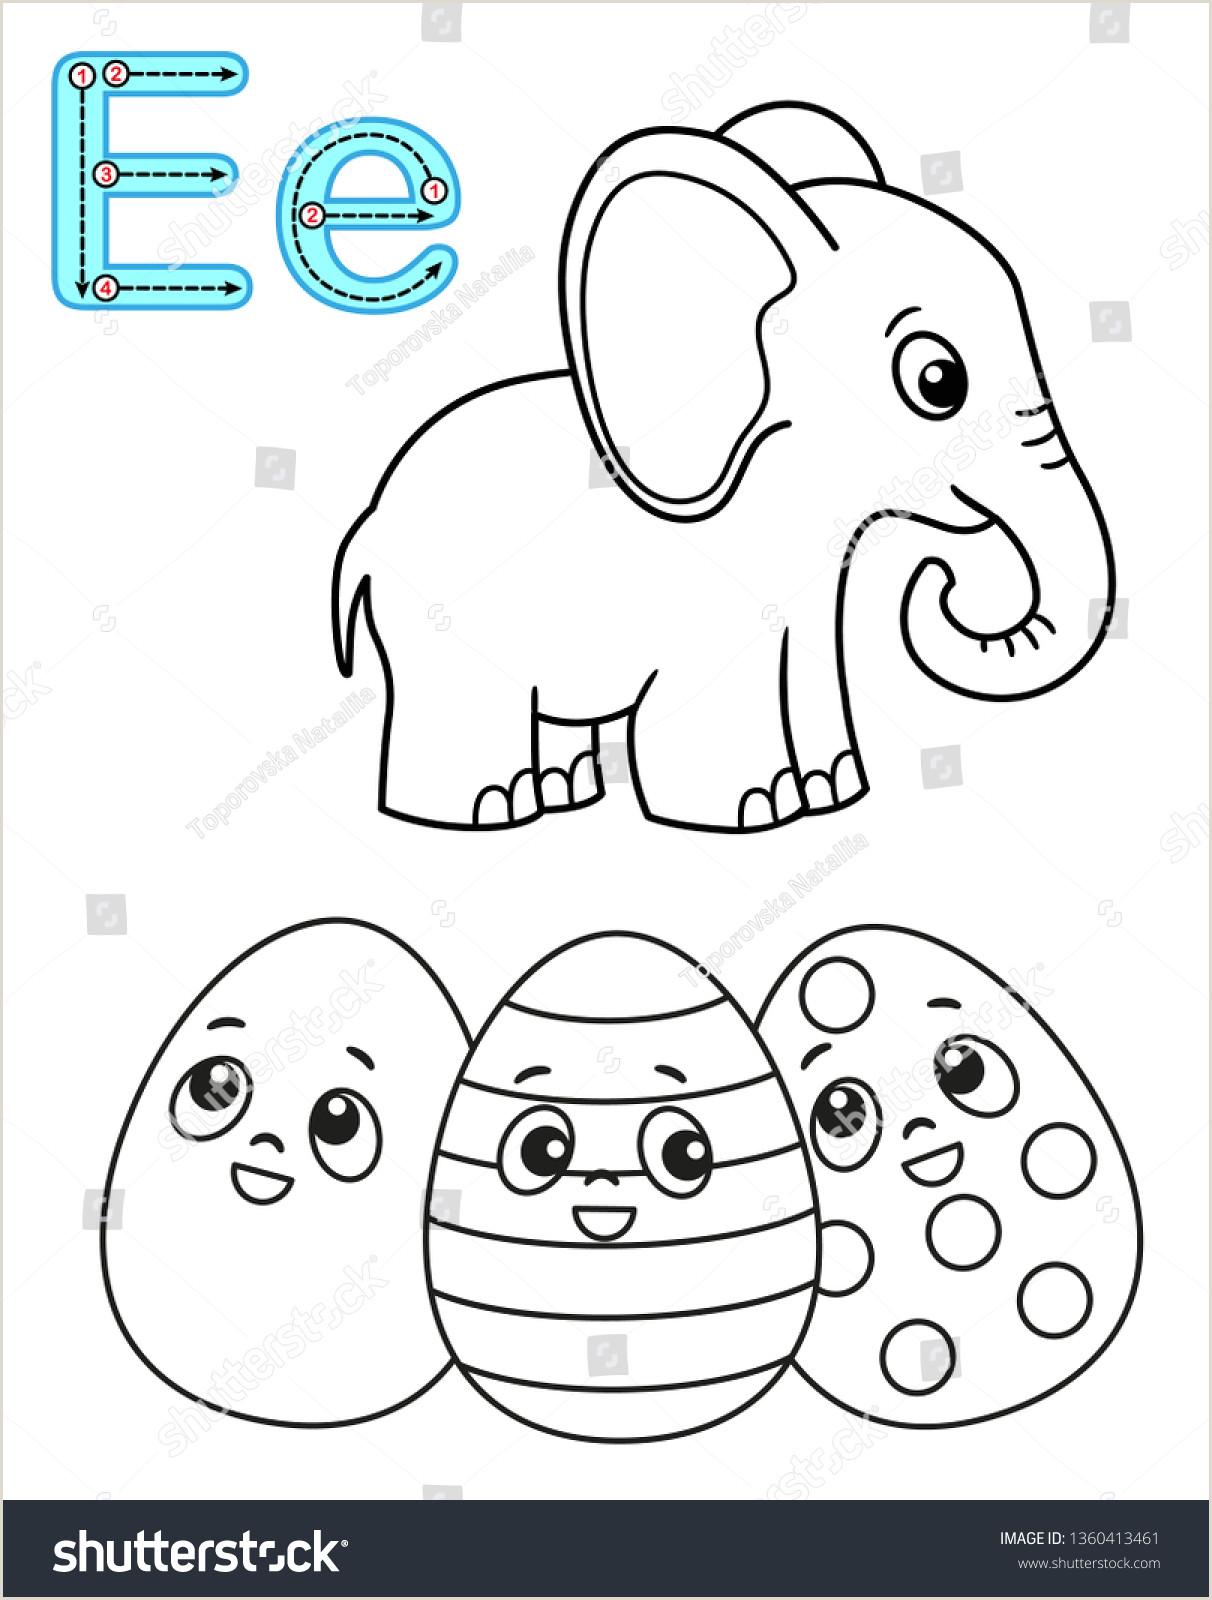 Color By Number Worksheets Free Printable